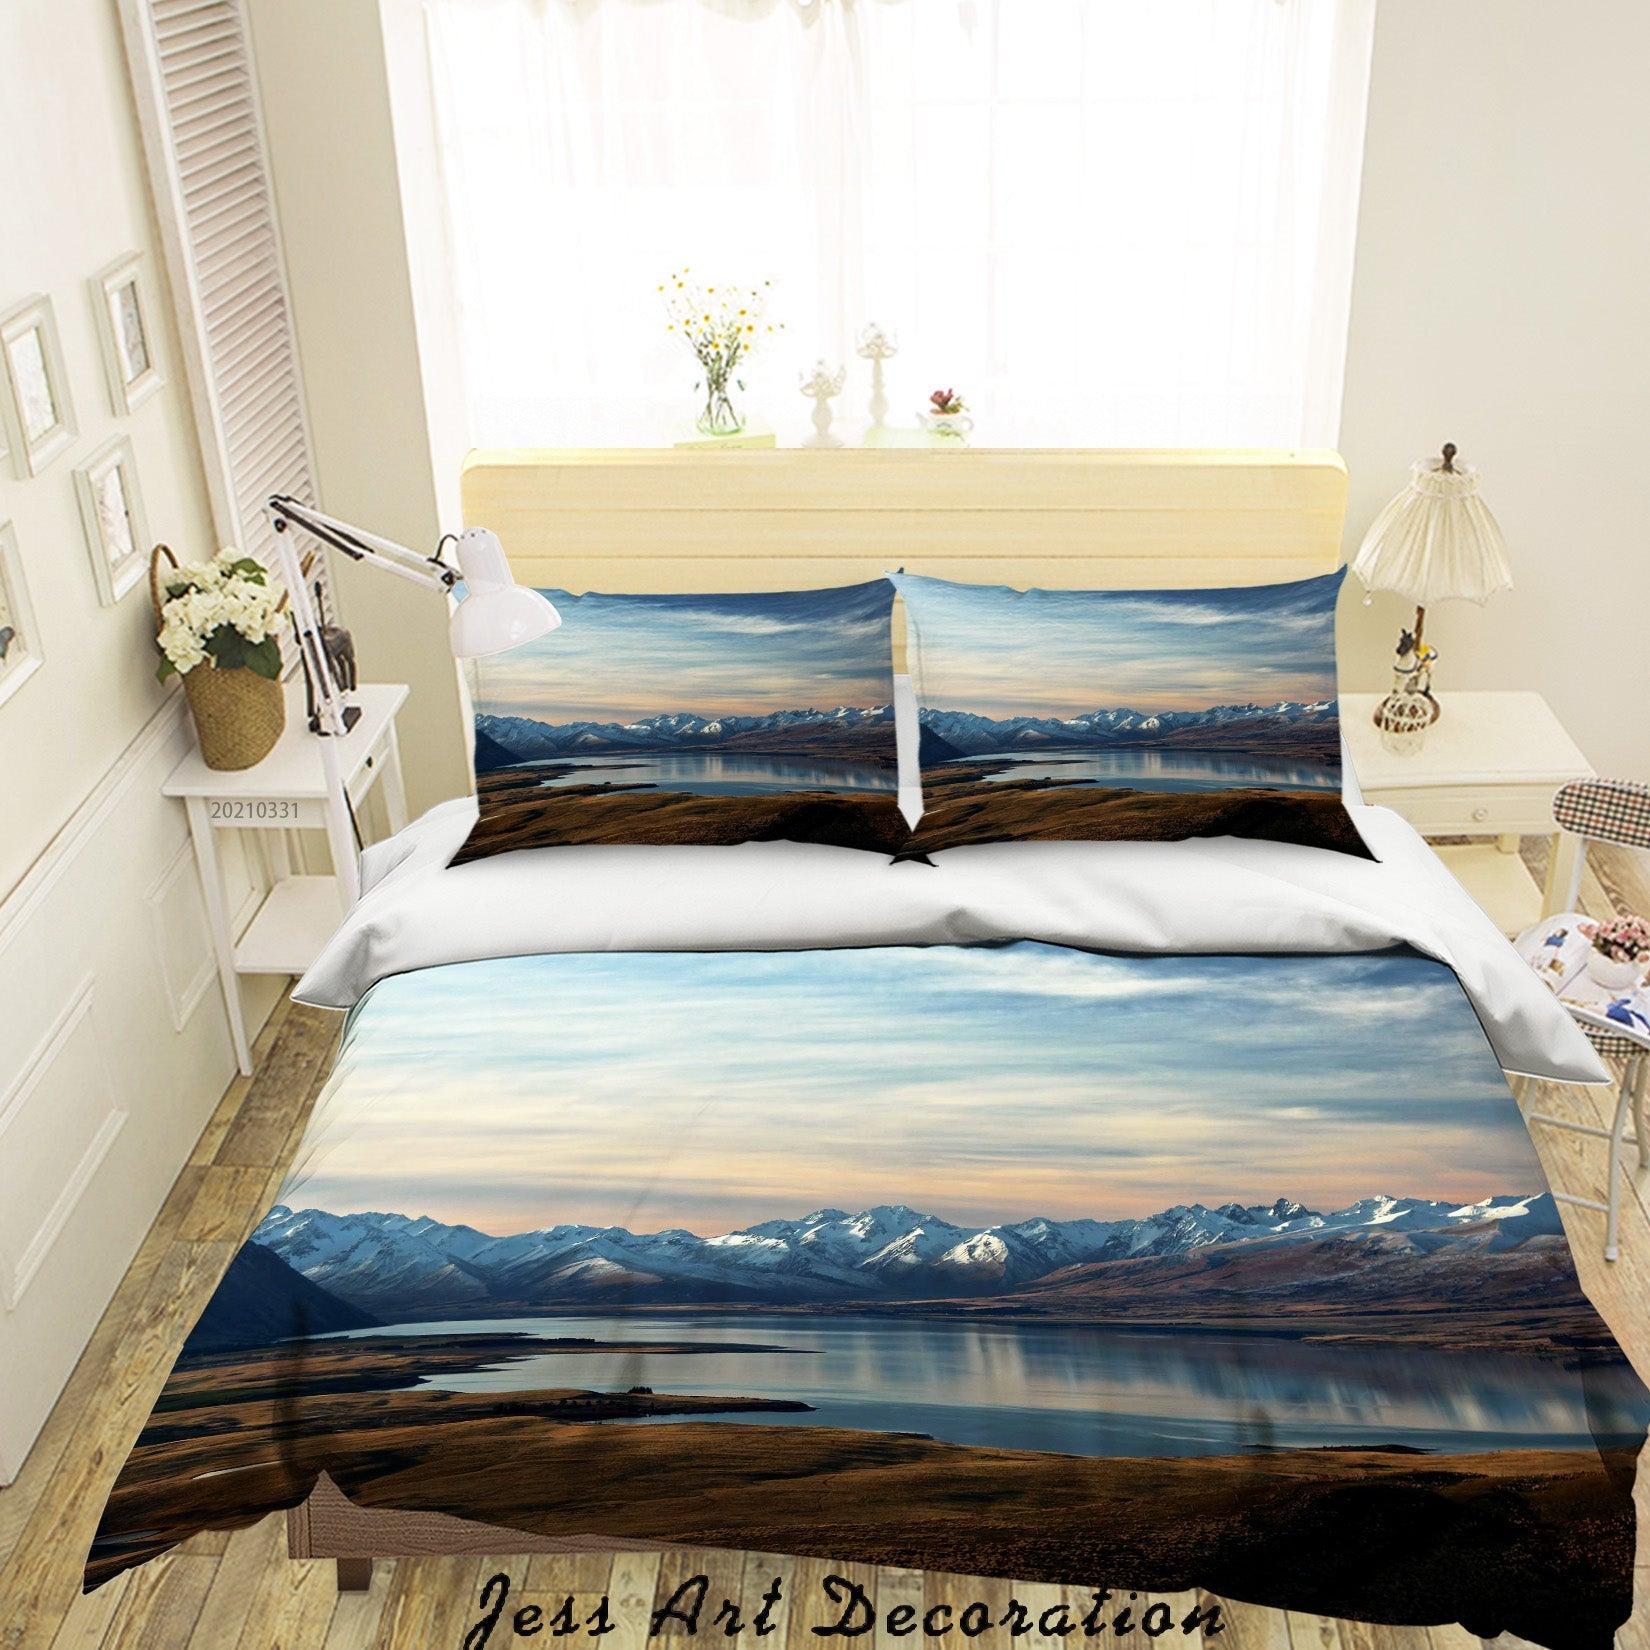 3D Sky Mountain Lake Landscape Quilt Cover Set Bedding Set Duvet Cover Pillowcases 309